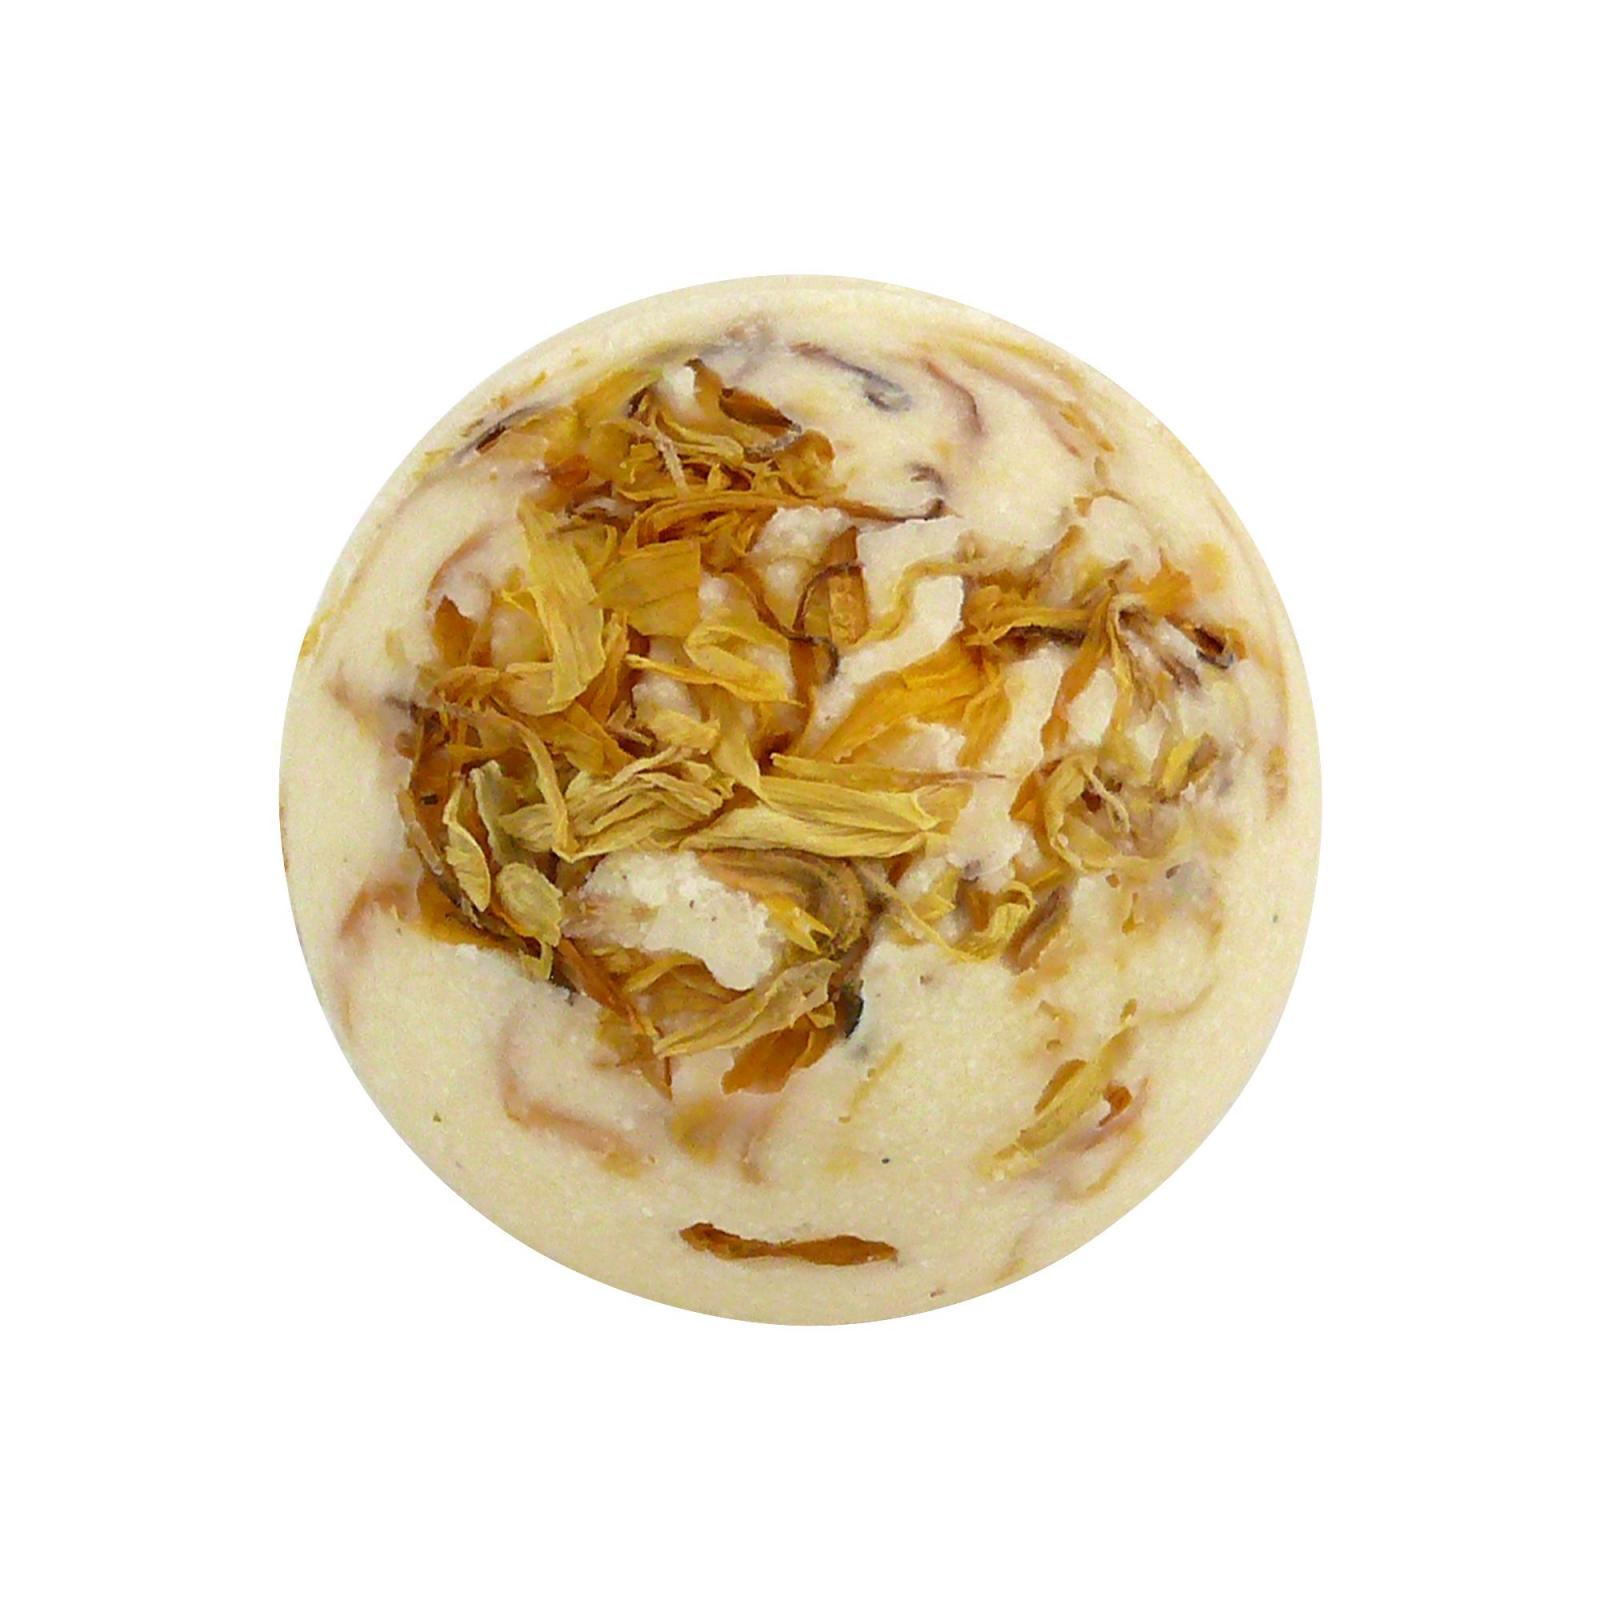 Ceano Cosmetics Krémová kulička do koupele vanilka 50 g,1 ks